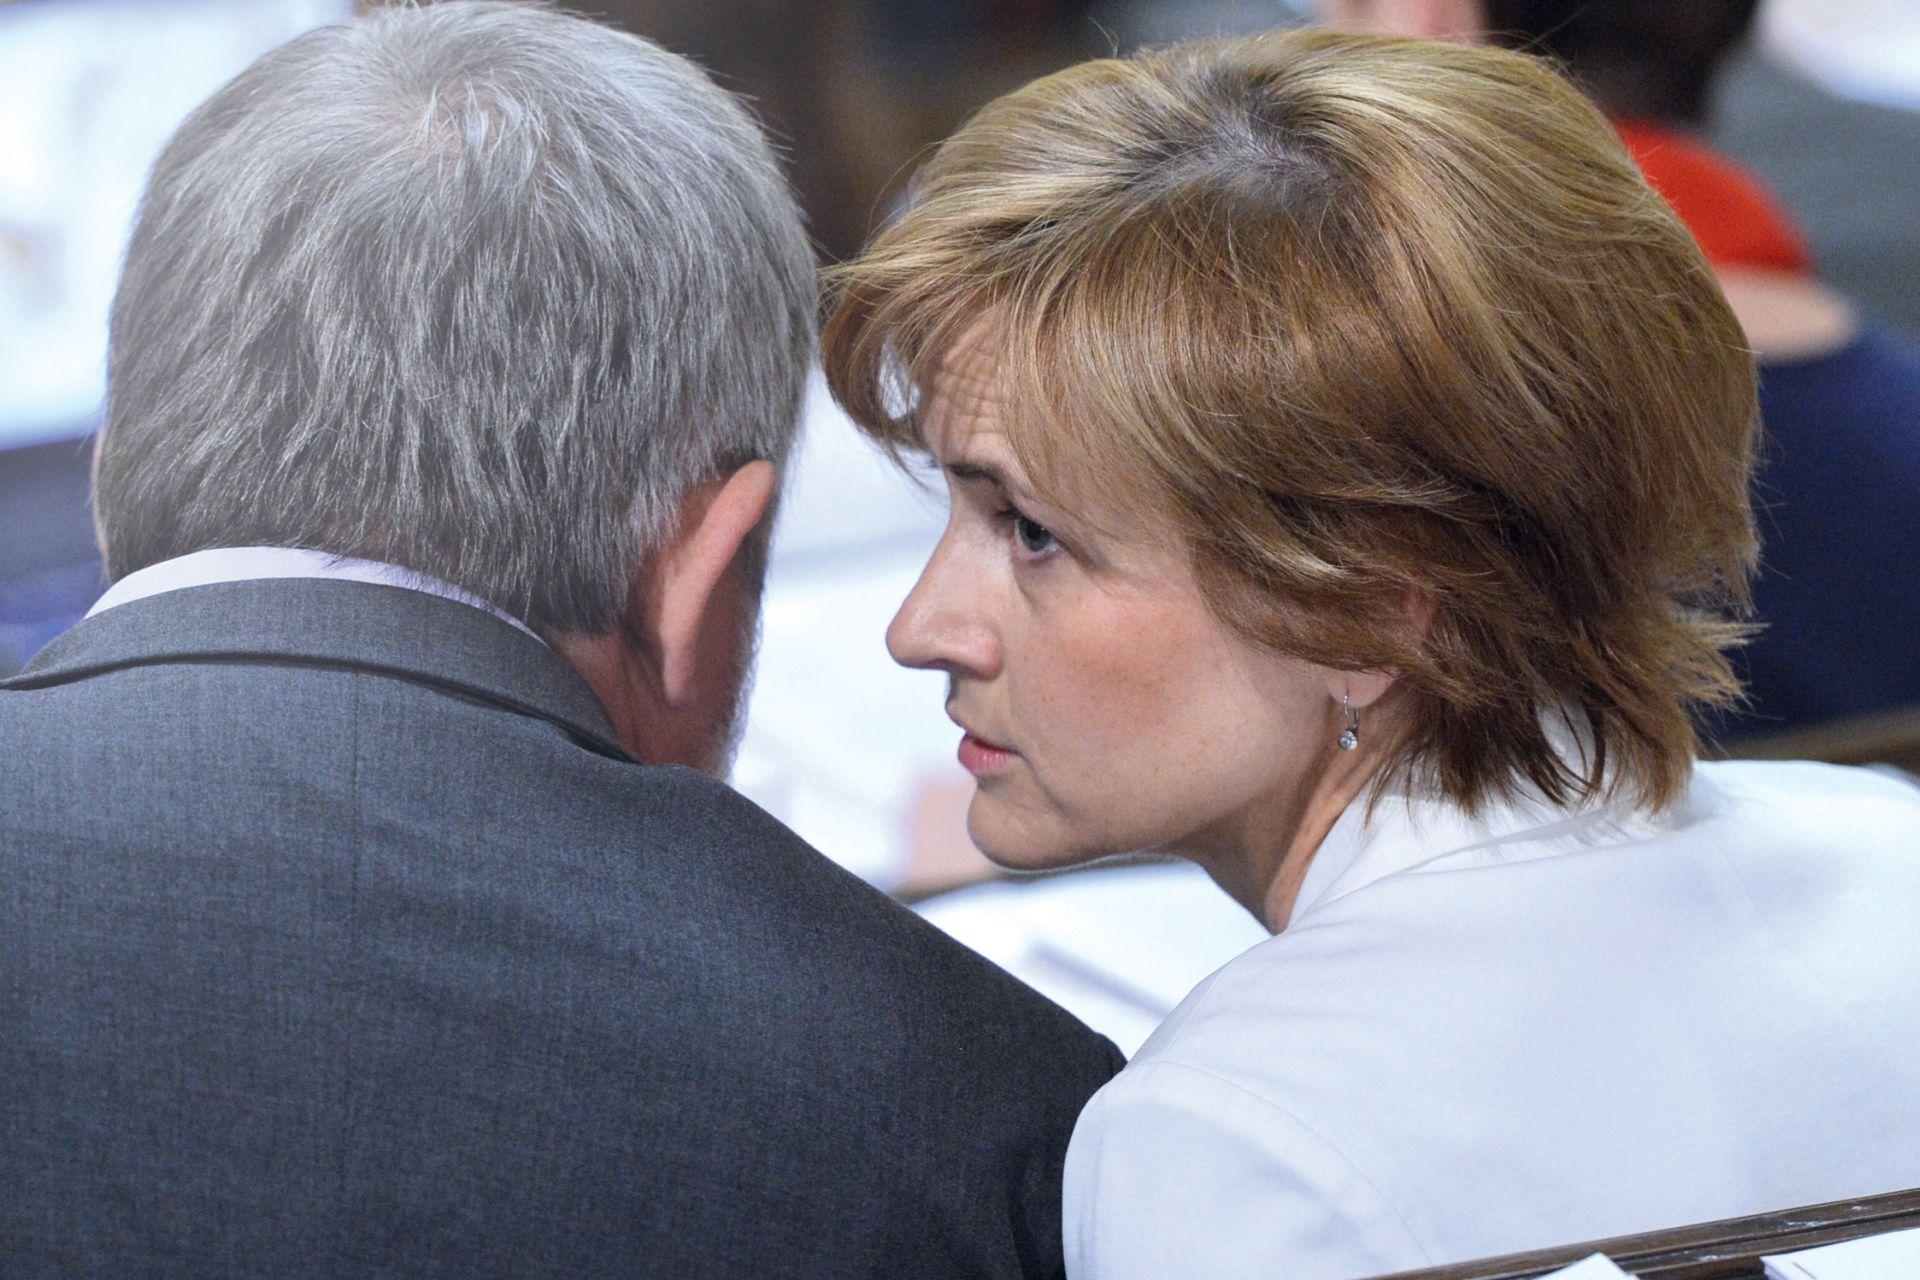 HNS i HSLS suparnici u bitki za Zagreb, ali idu skupa na parlamentarne izbore